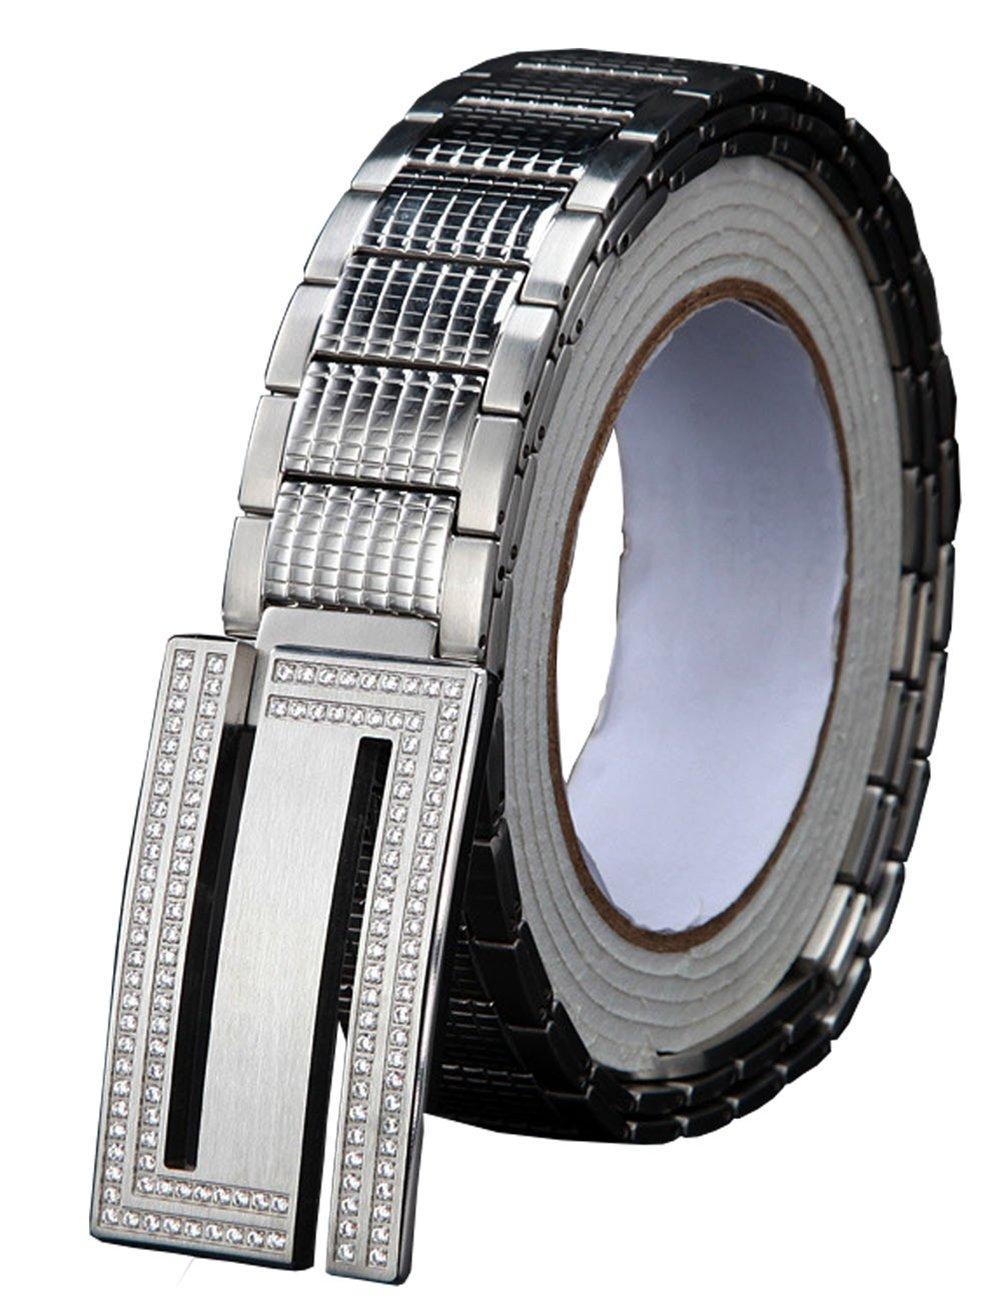 Menschwear Men's Stainless Steel Belt Slide Buckle Adjustable 32mm 152 Silver 130cm